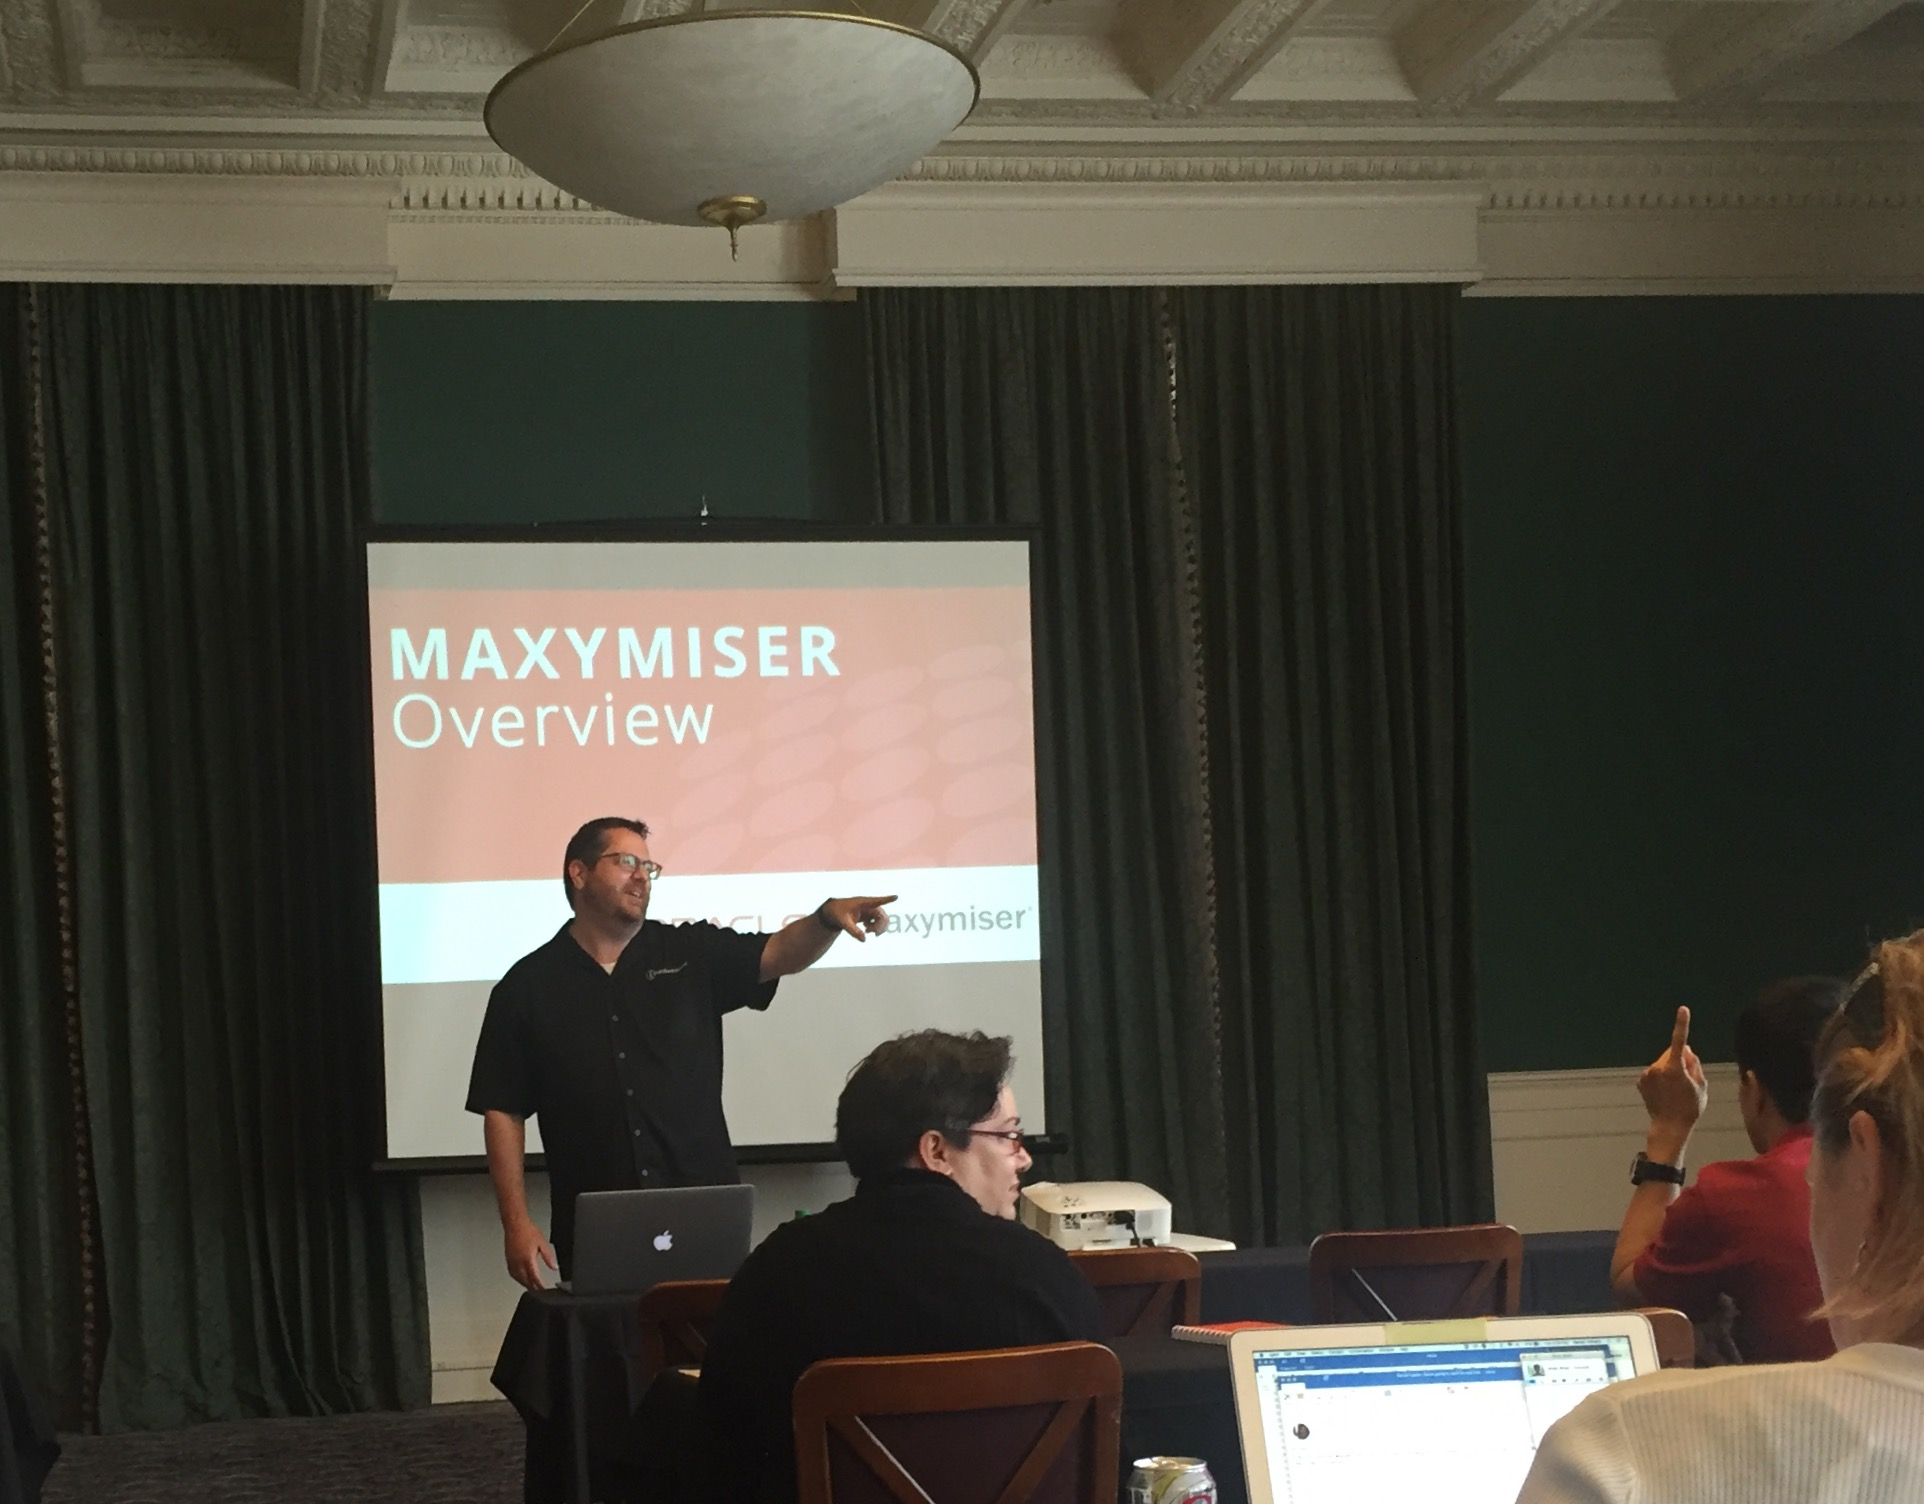 User Group presentation on Oracle Maxymiser